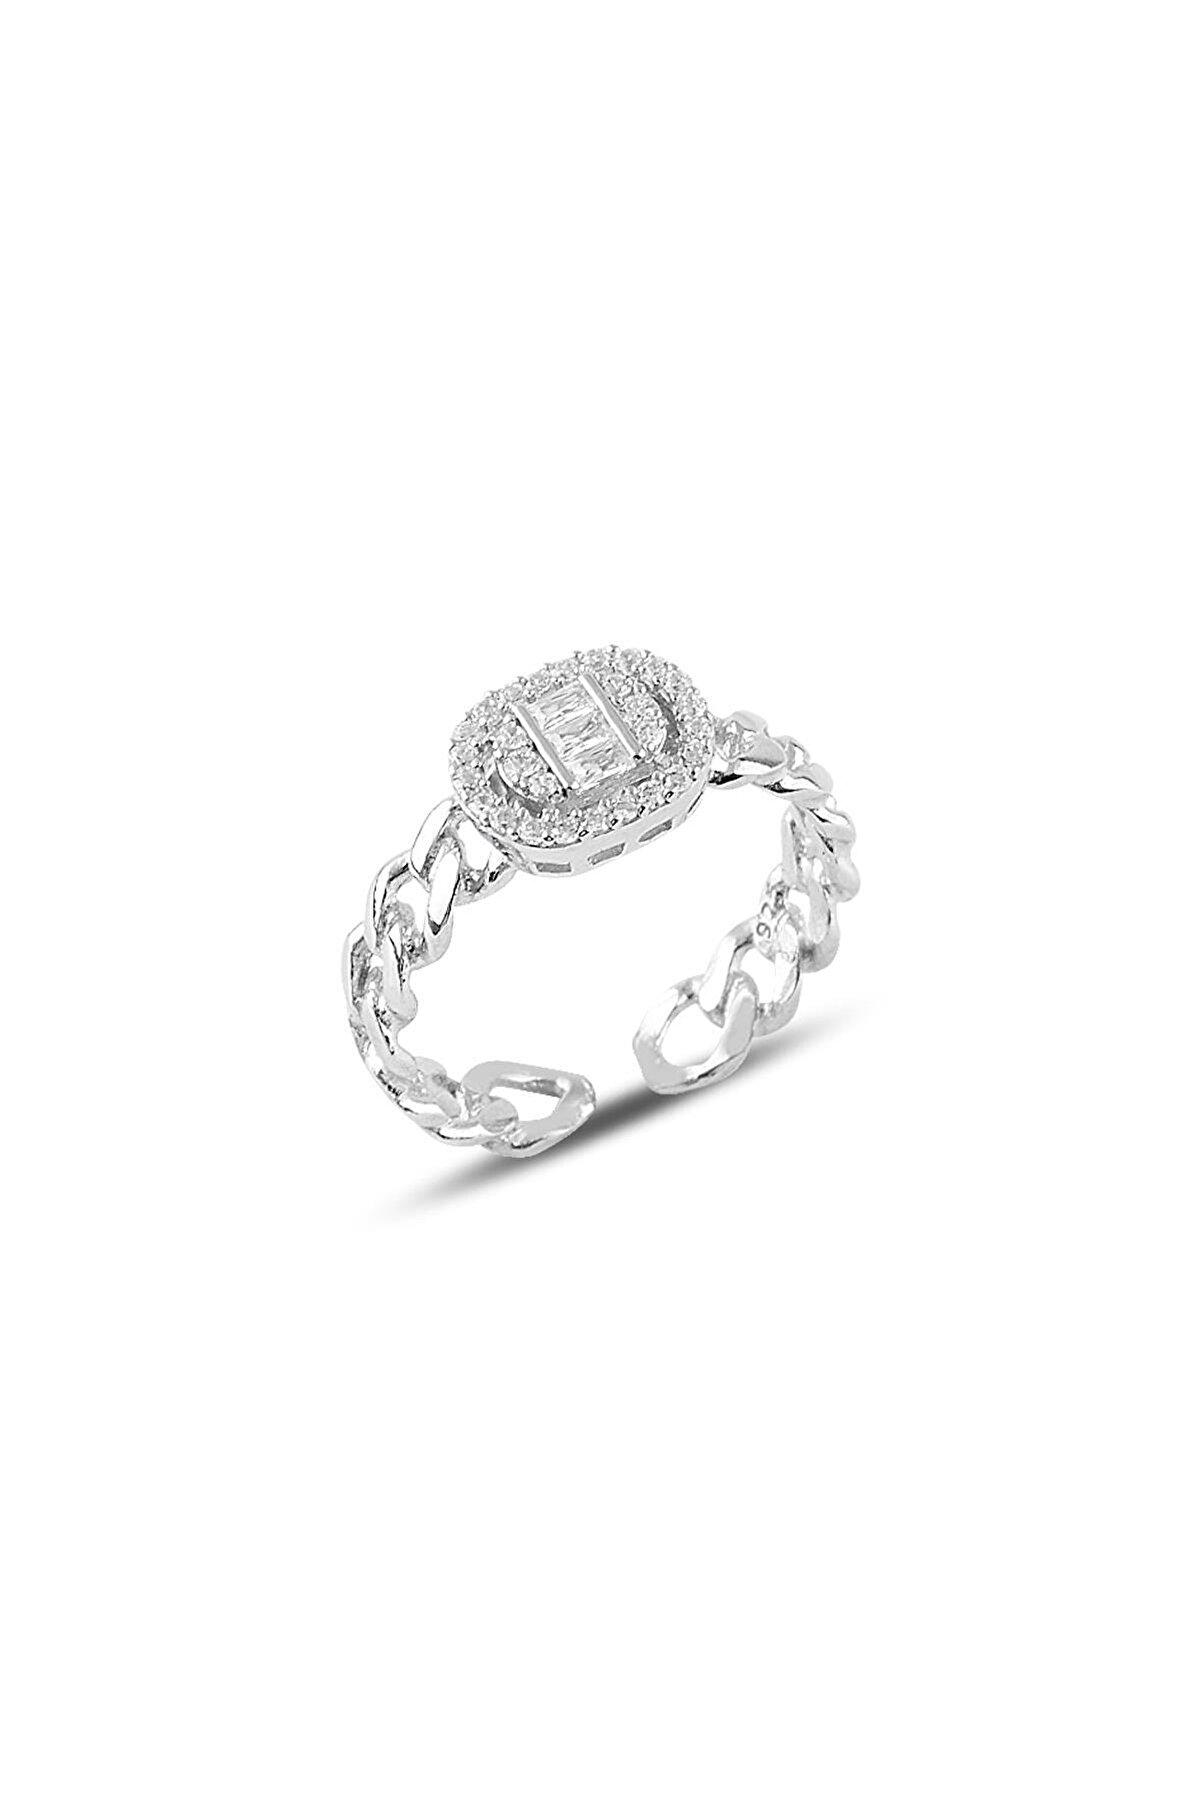 Söğütlü Silver Gümüş Ayarlamalı Pırlanta Modeli Zincir Yüzük